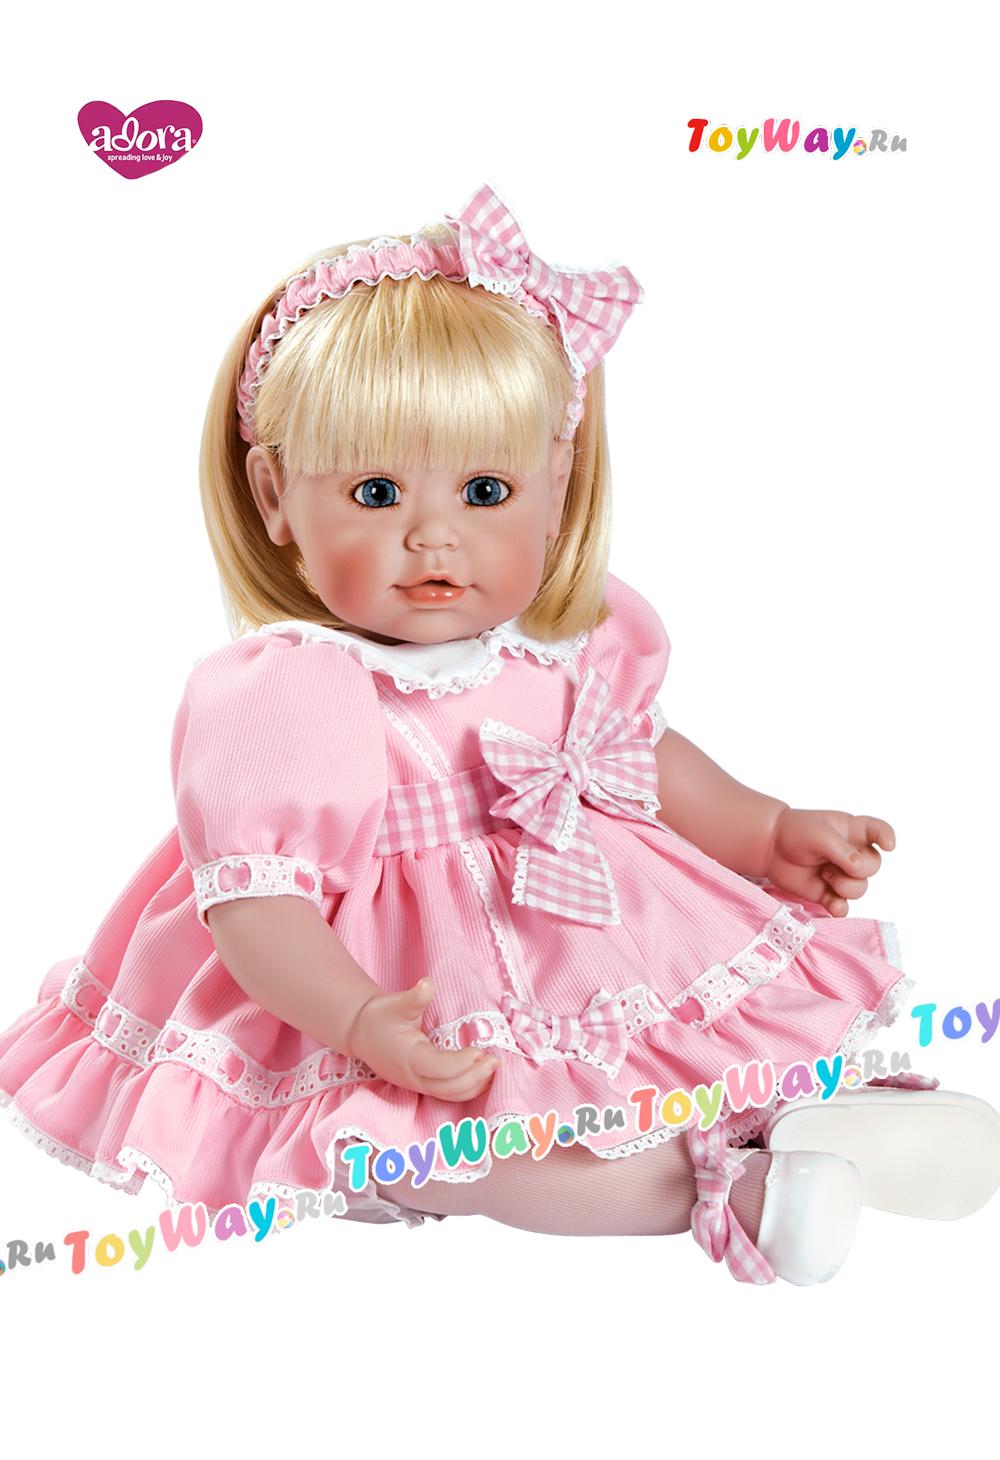 Кукла - Сладкий парфе, 48 смКуклы Адора<br>Кукла - Сладкий парфе, 48 см<br>